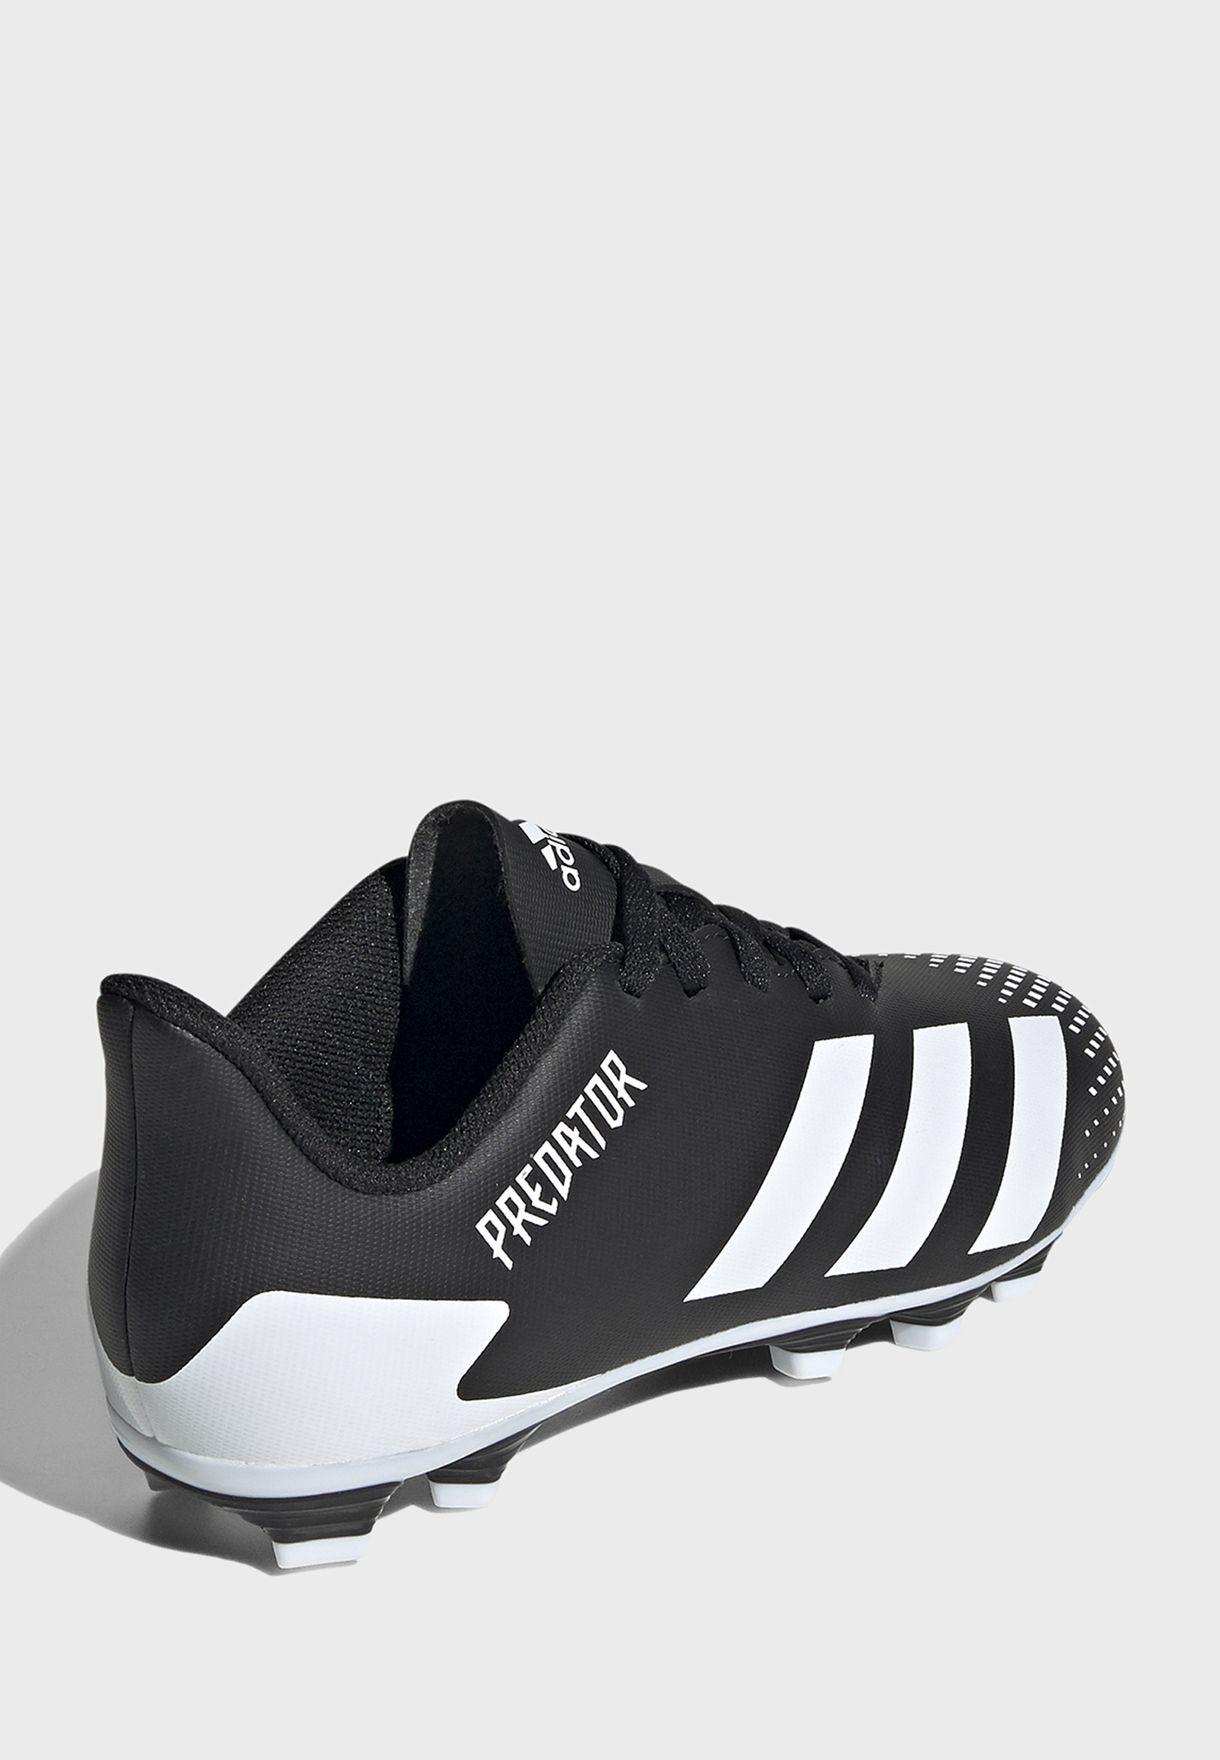 حذاء بريداتور 20.4 اف اكس جي